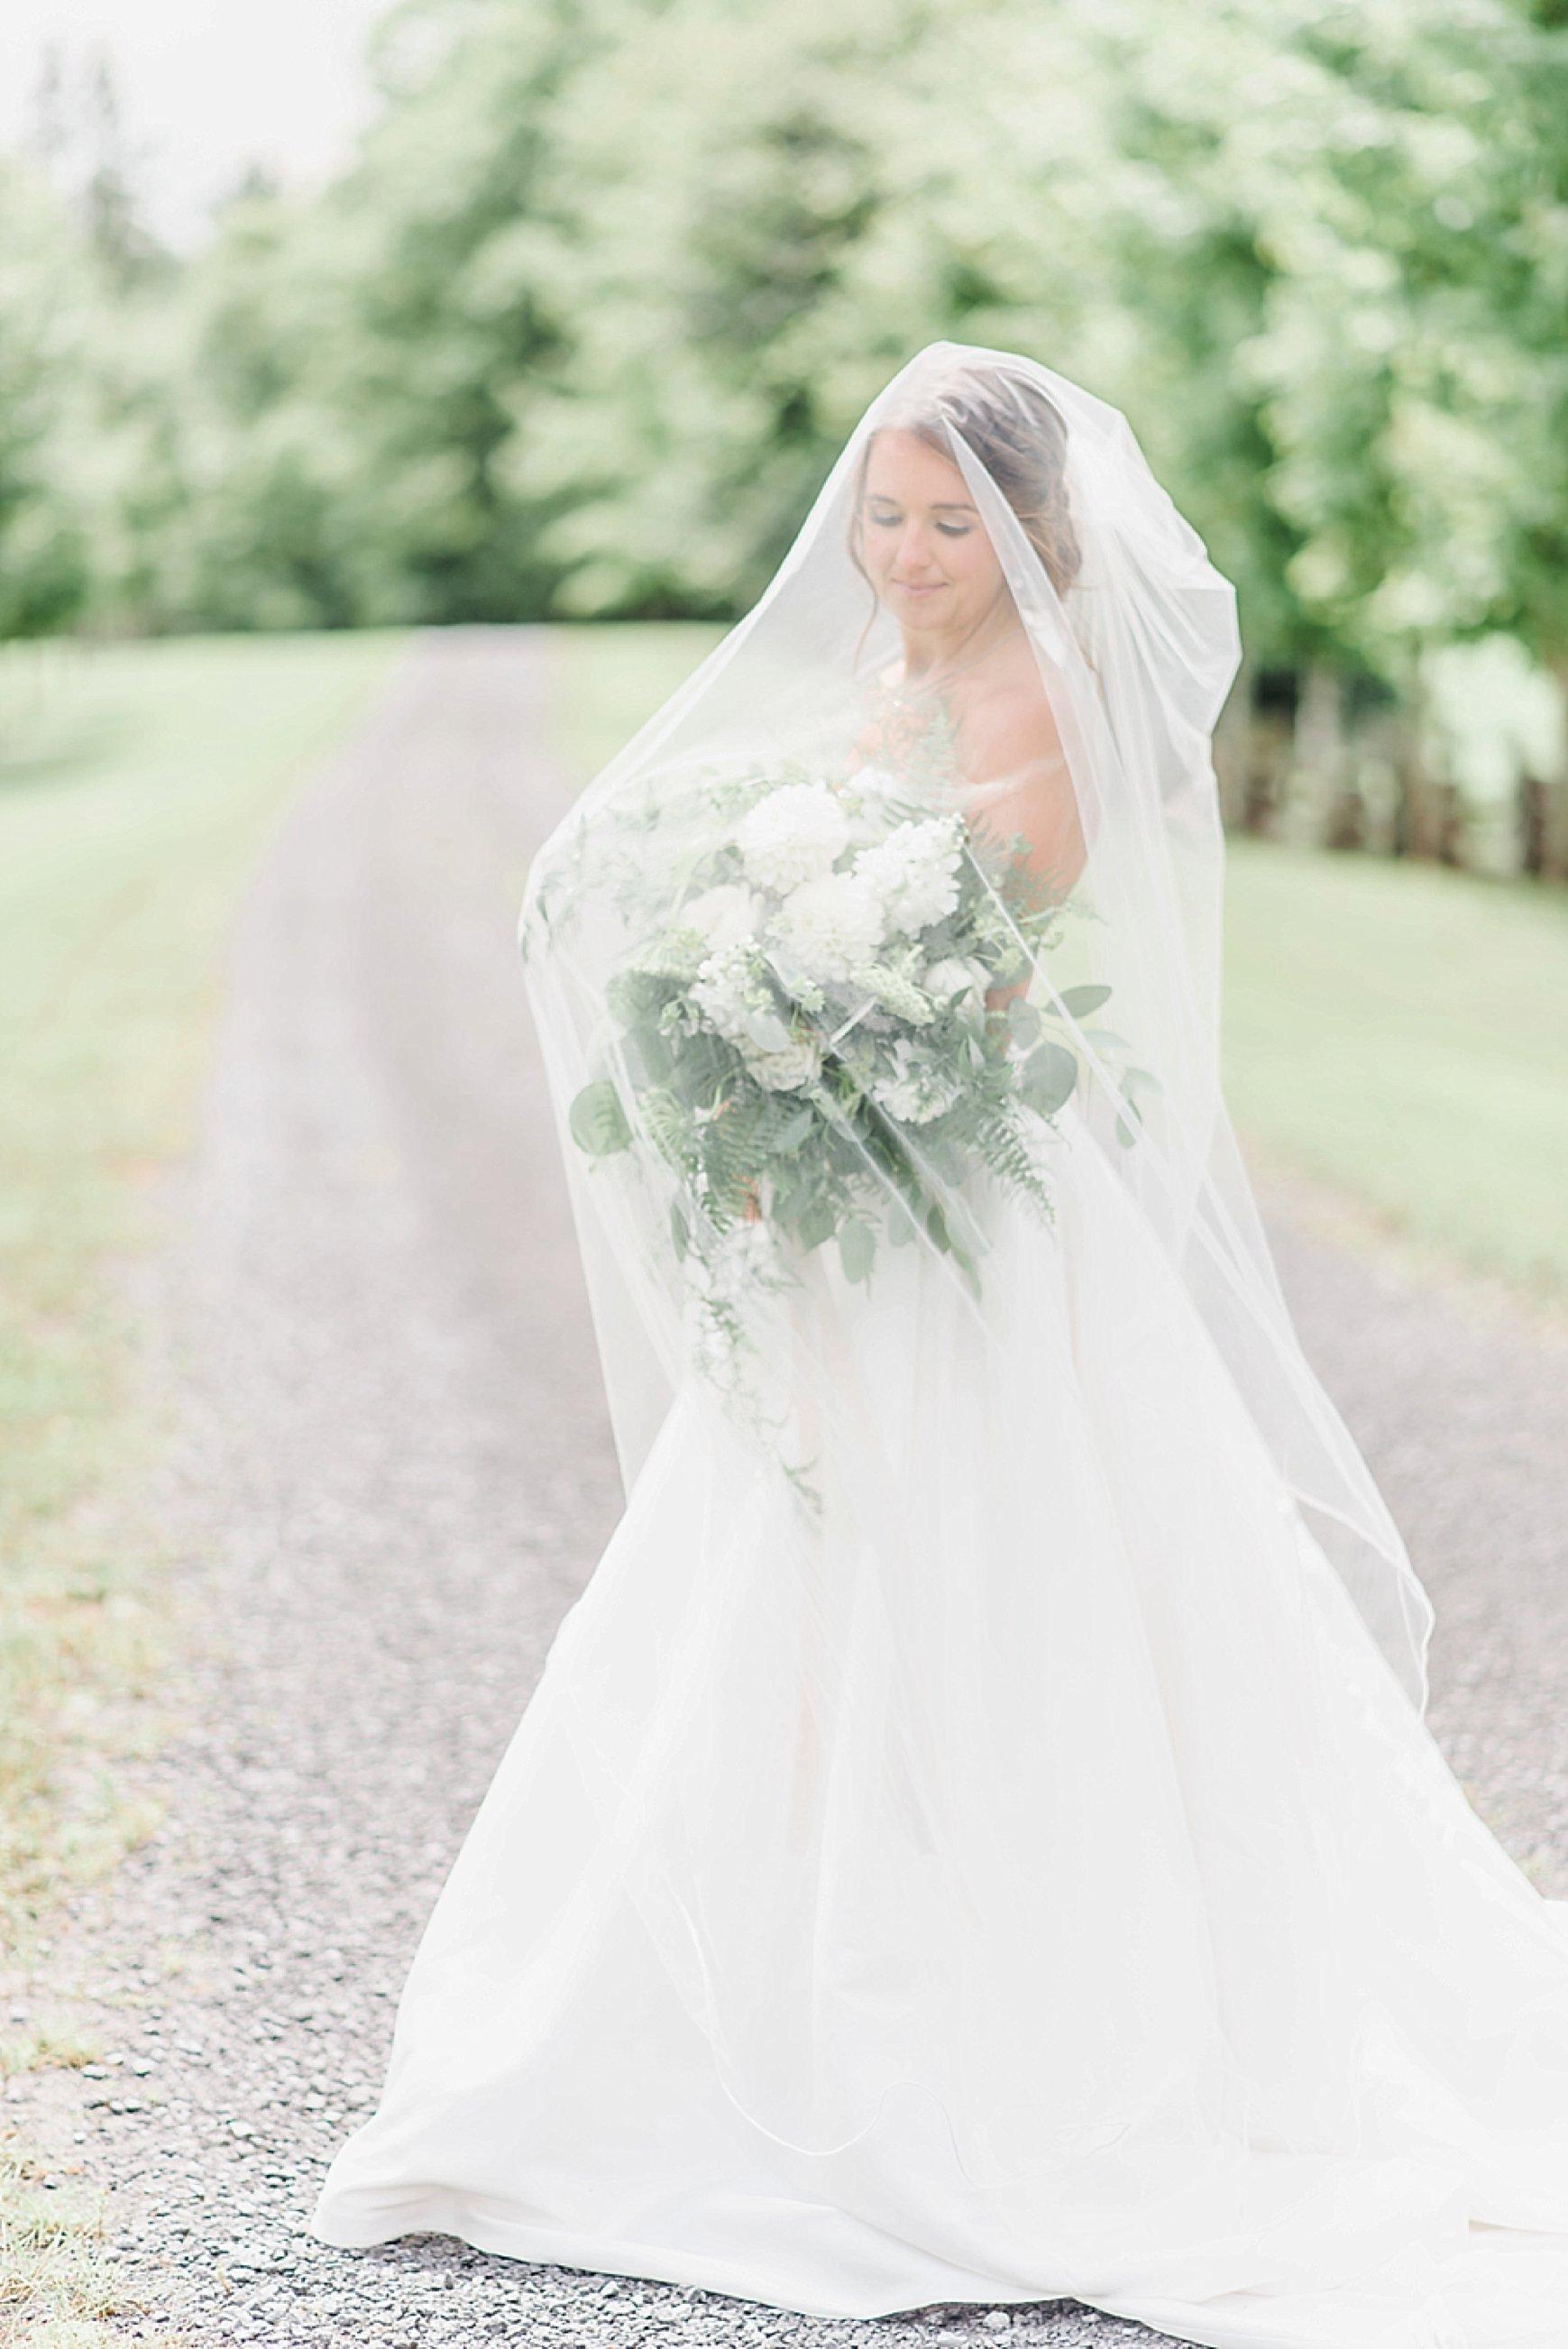 light airy indie fine art ottawa wedding photographer | Ali and Batoul Photography_0500.jpg